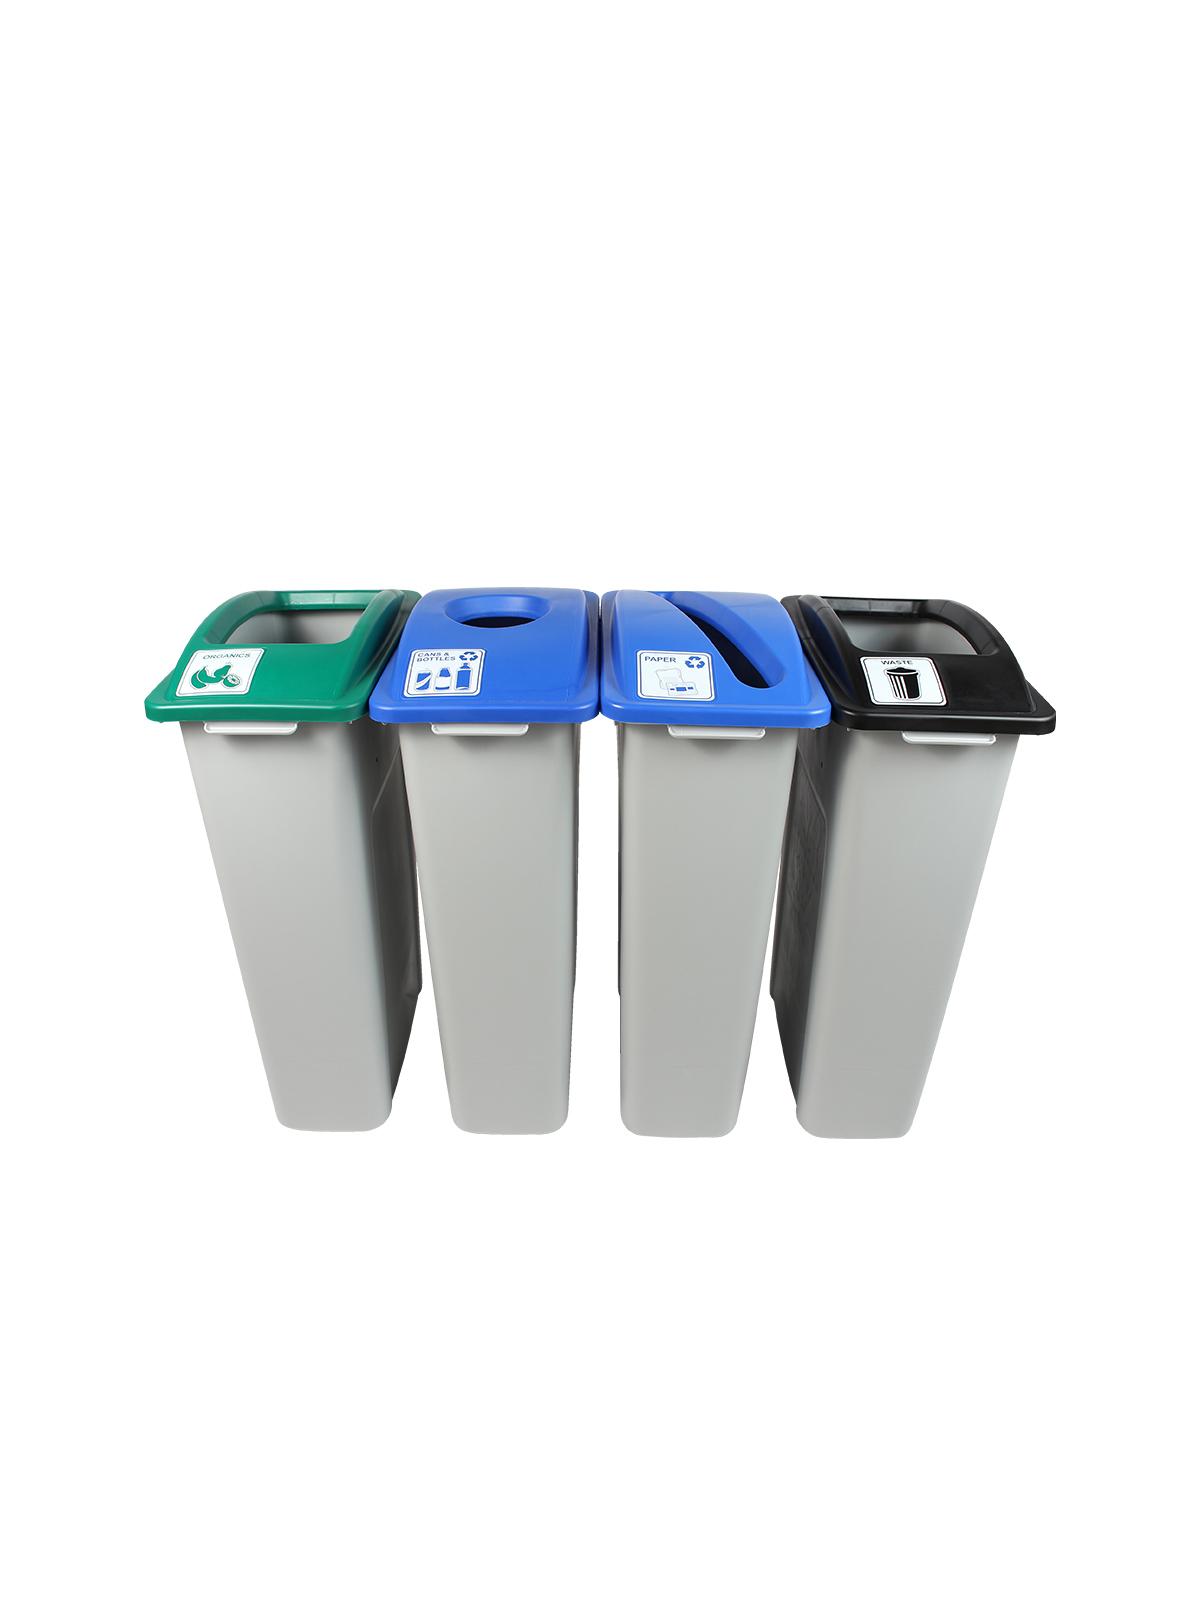 WASTE WATCHER - Quad - Cans & Bottles-Paper-Compost-Waste - Circle-Slot-Full - Grey-Blue-Blue-Green-Black